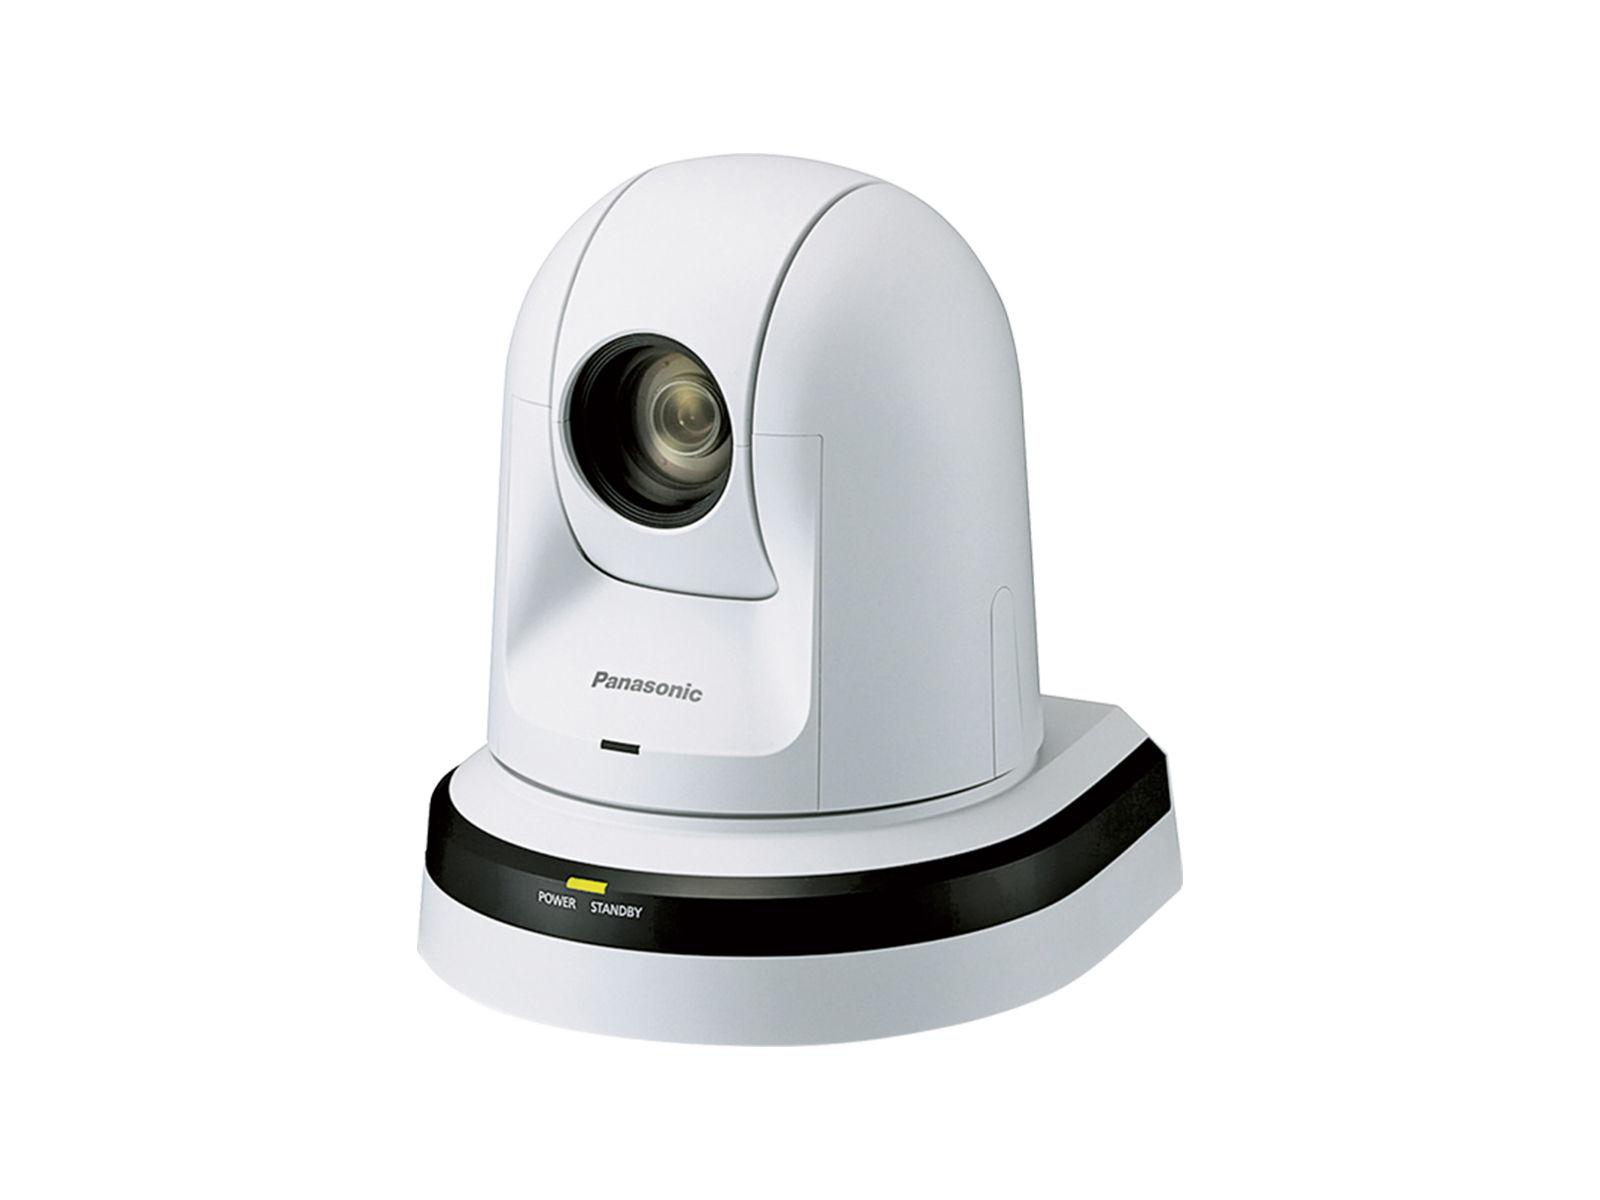 Panasonic AW-HE38HWEJ | HD-Kamera, PTZ, HDMI, 1/2,3-Typ-MOS,, 22fach optischer Zoom, weiss